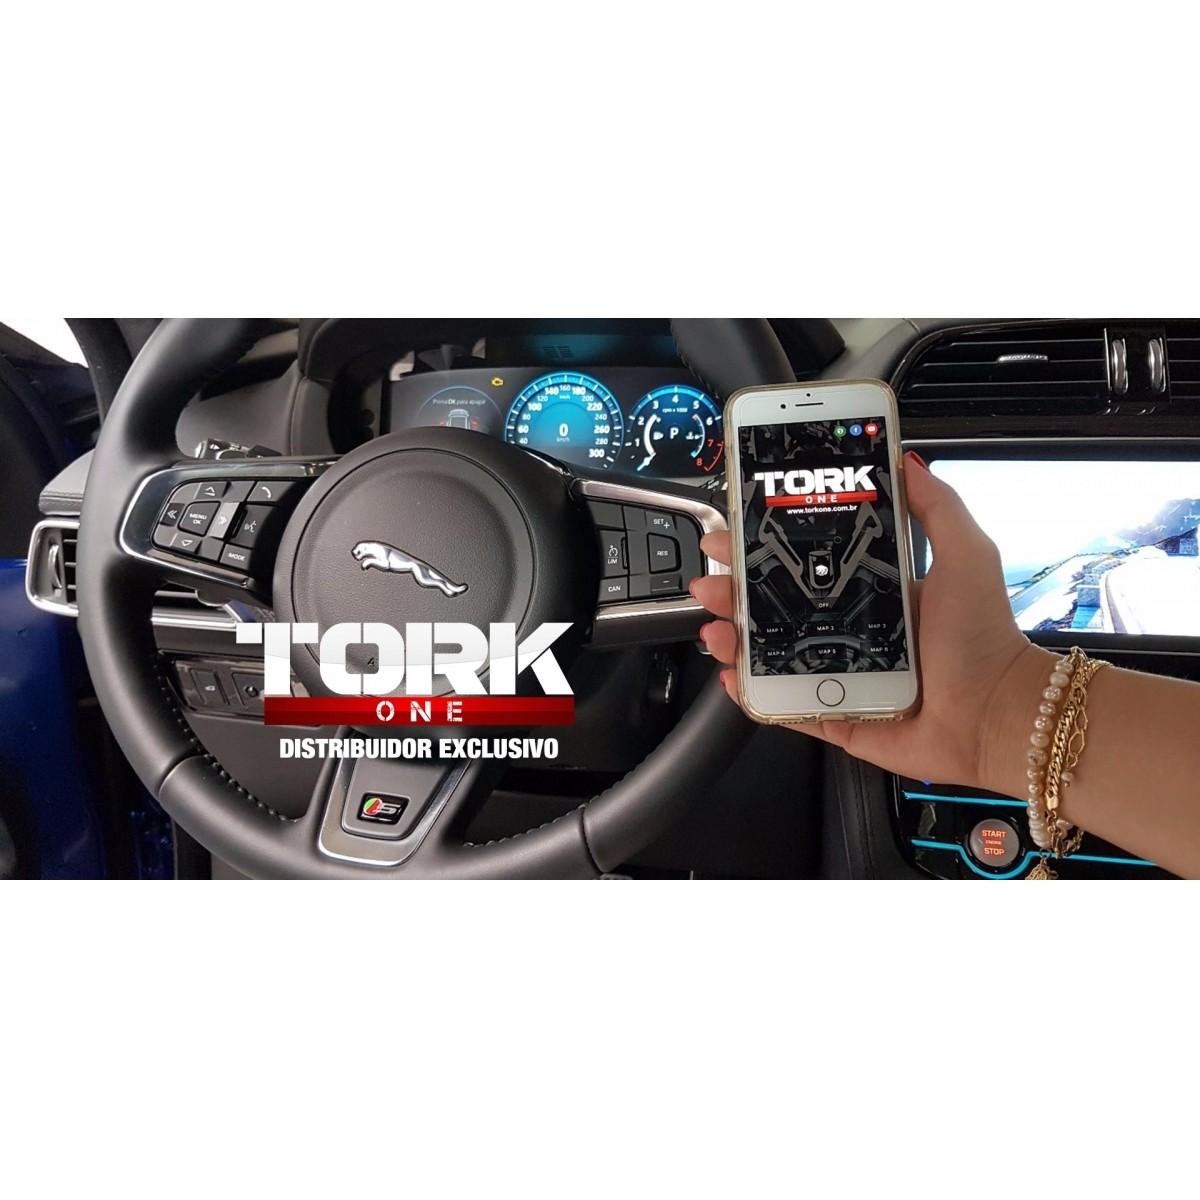 Gás Pedal - Alfa Romeo - Tork One c/s Bluetooth